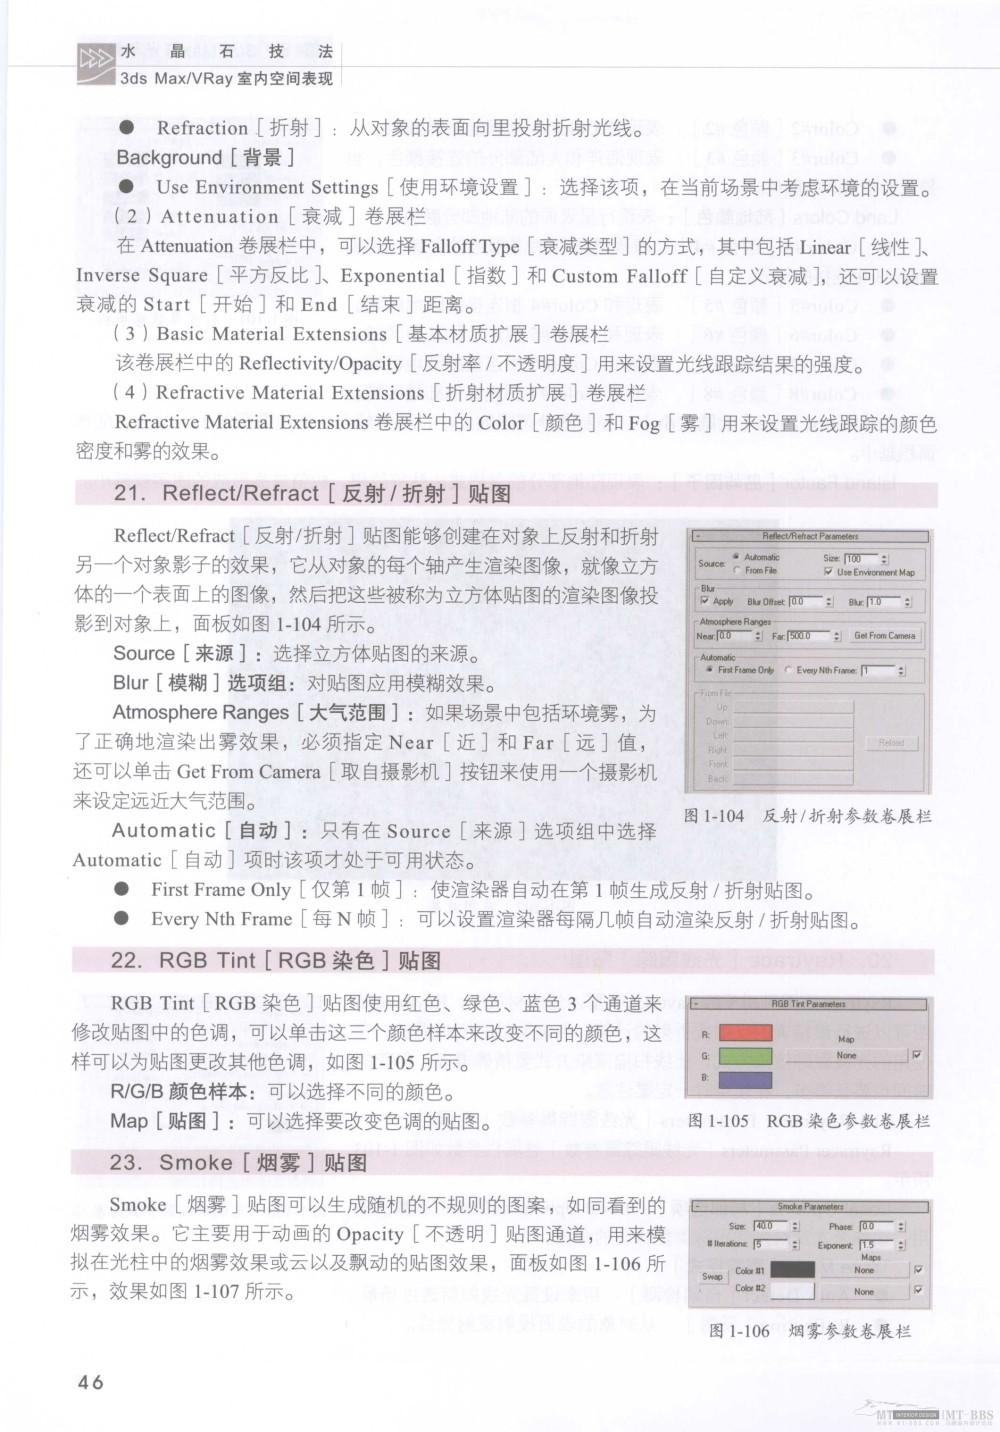 水晶石技法-3ds_Max&VRay室内空间表现_水晶石技法-3ds_Max&VRay室内空间表现_页面_052.jpg